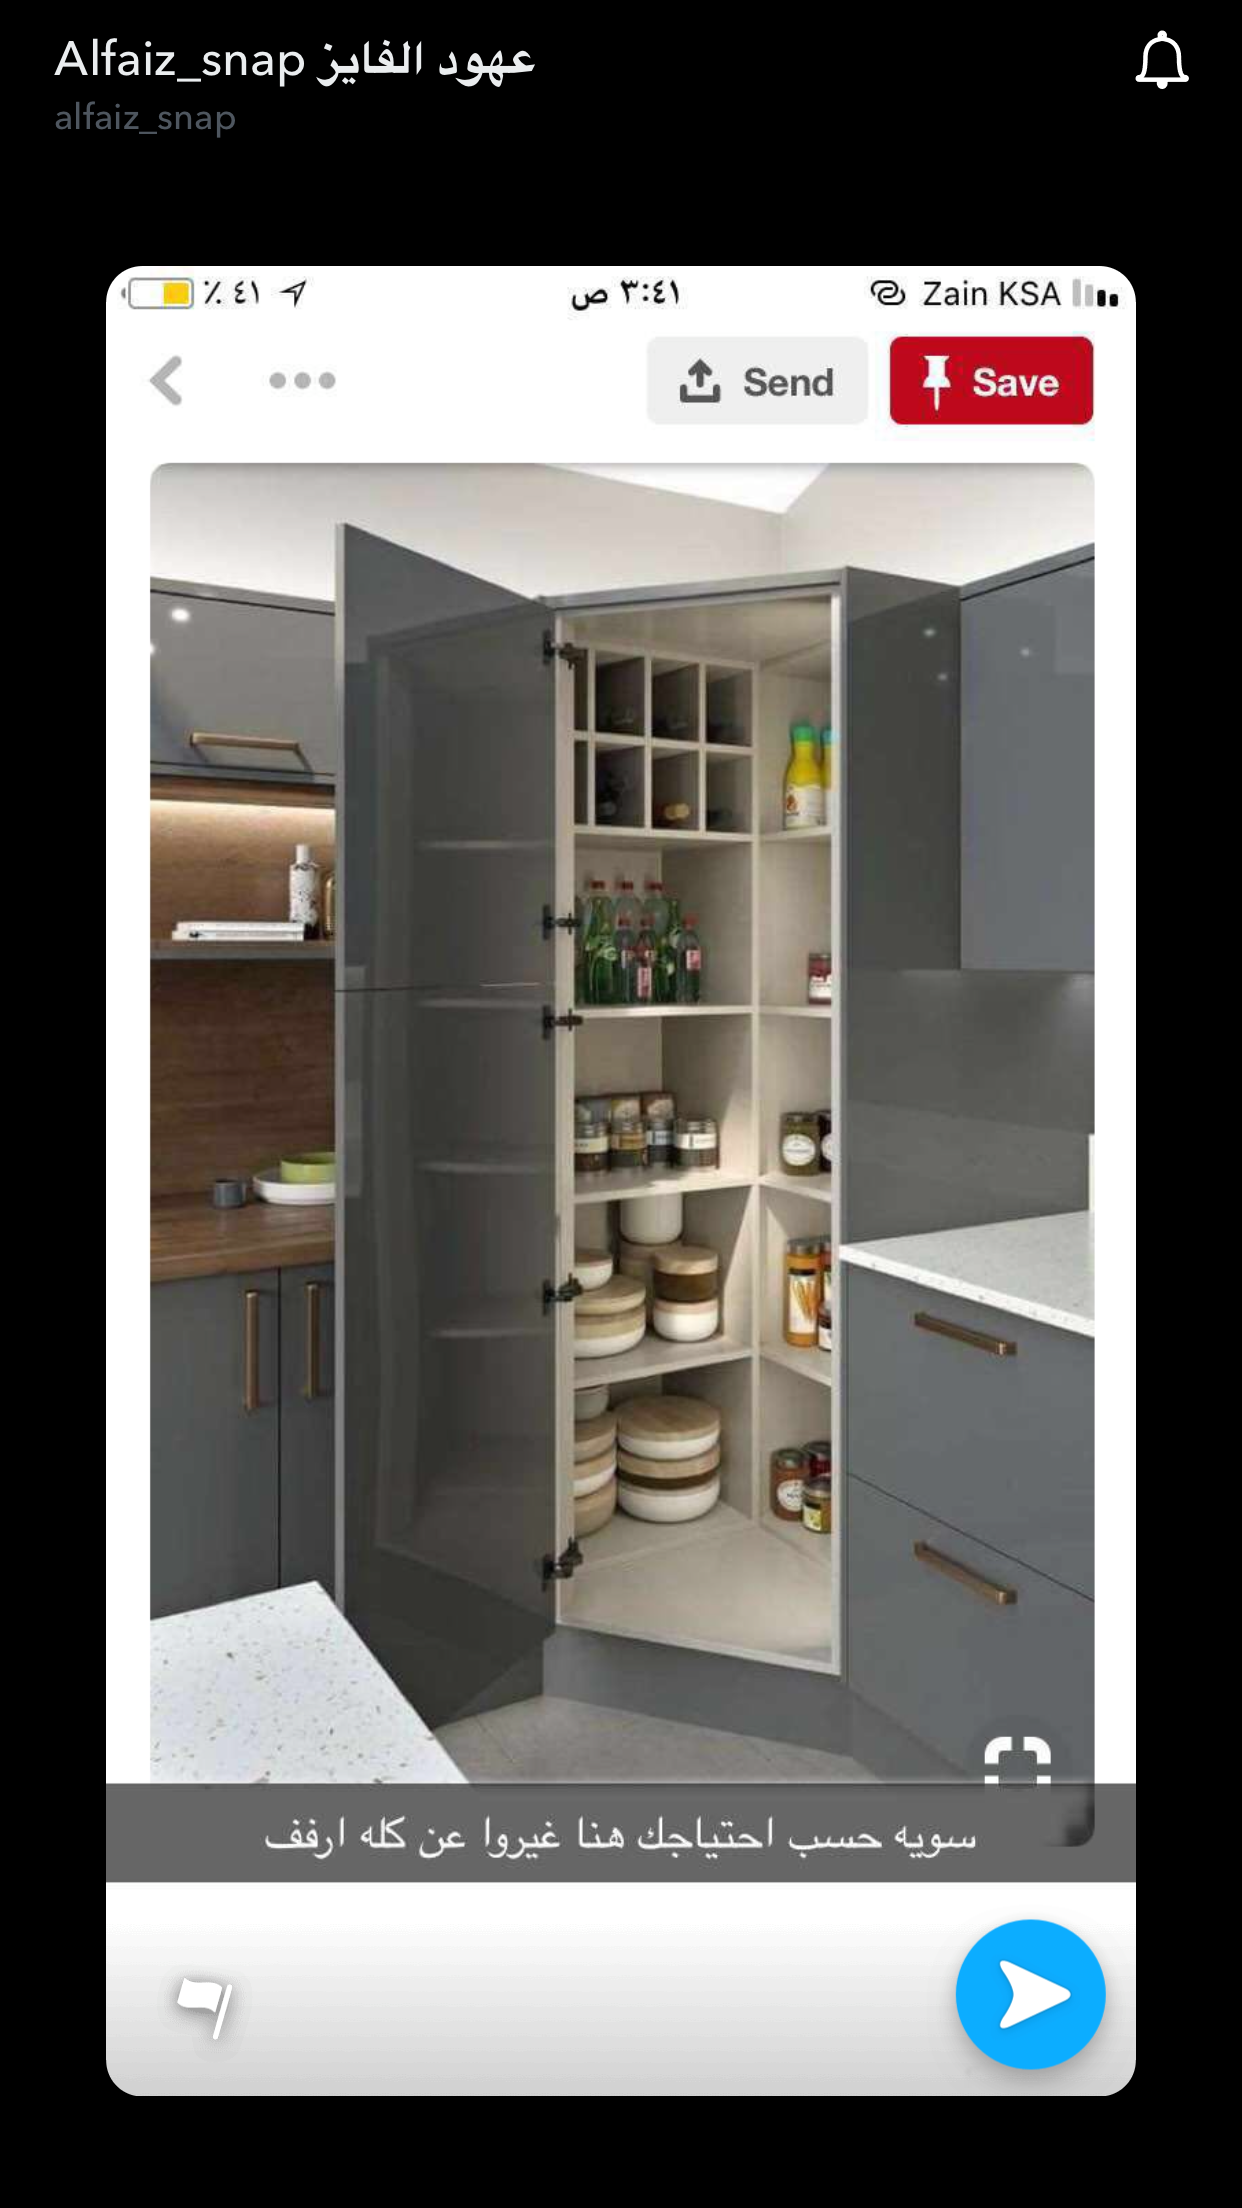 Pin By زينه On أفكار تصميم مدرسيه مطبخ اثاث Kitchen Decor Modern Pantry Design Kitchen Pantry Design